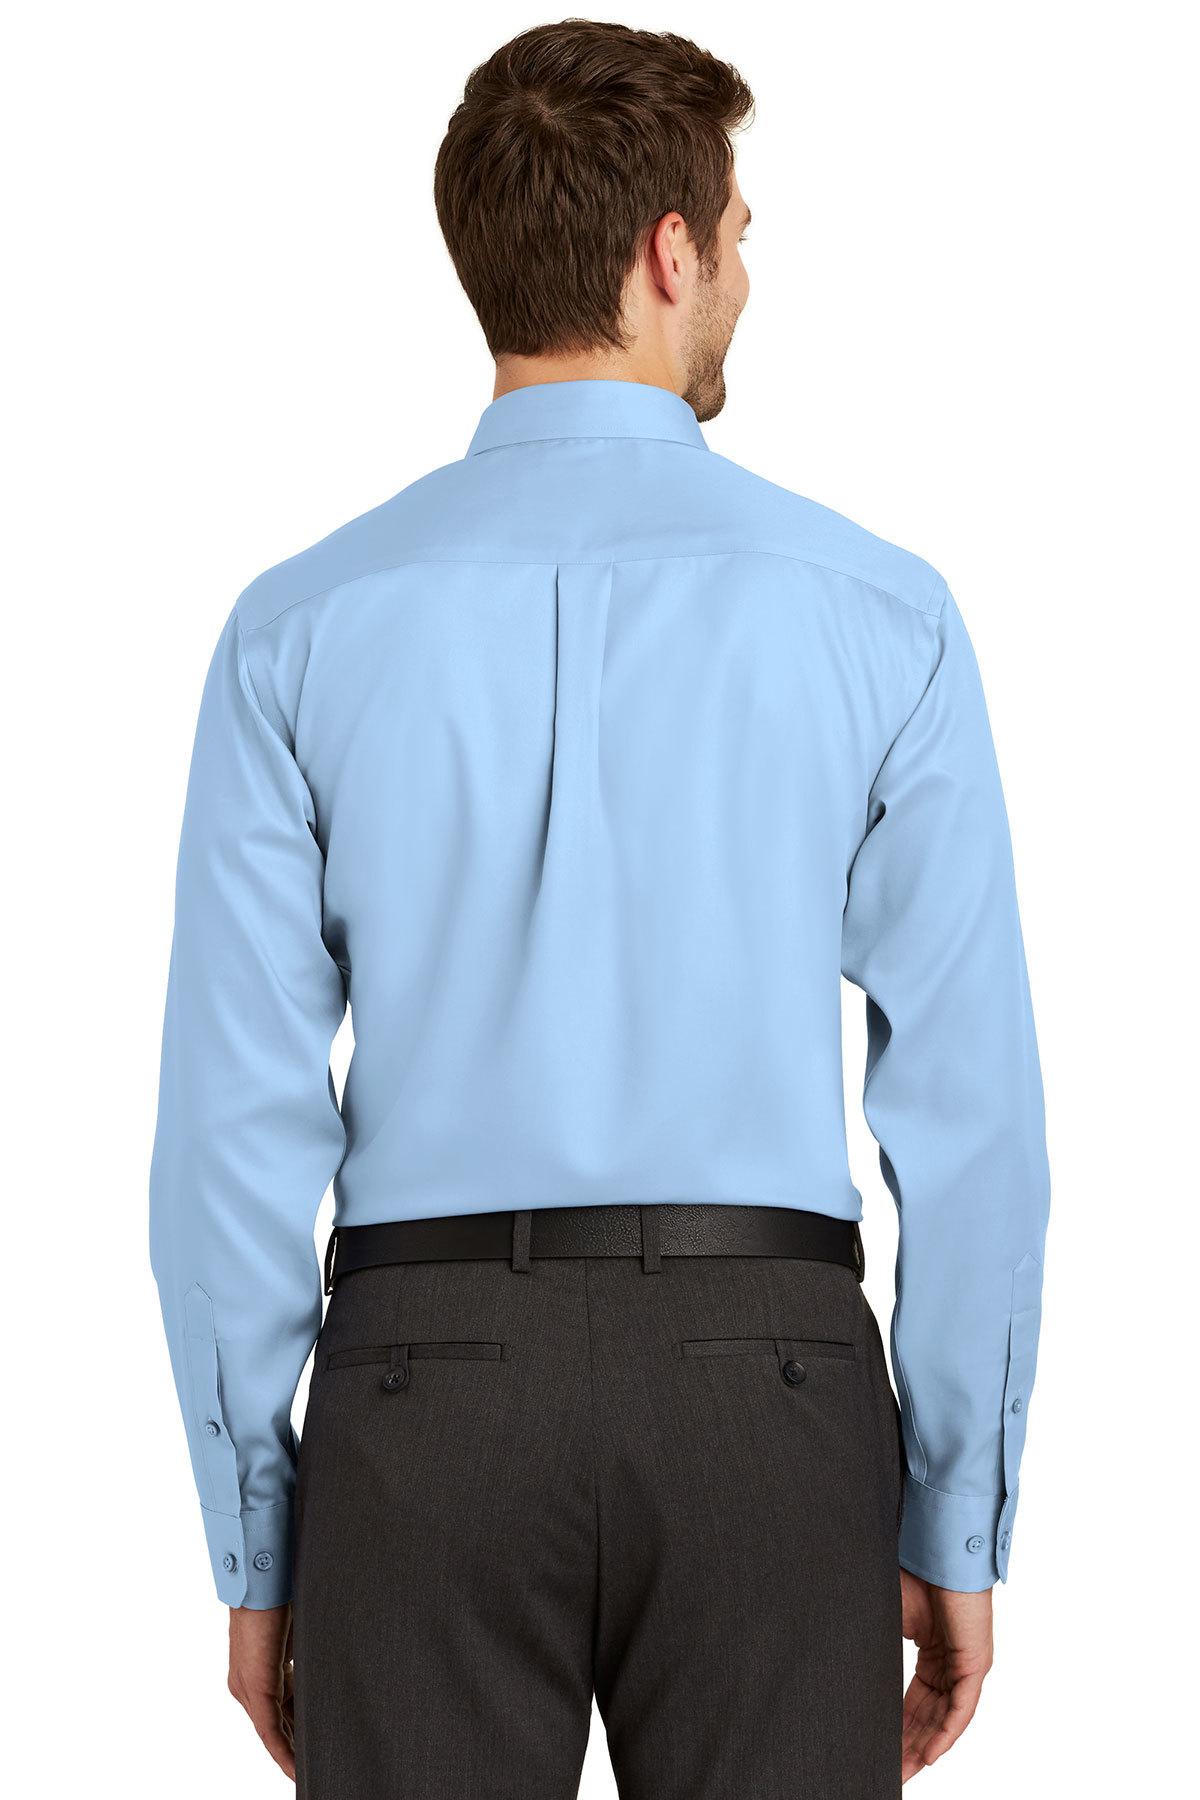 Port Authority Mens Long Sleeve Non-Iron Twill Shirt S638